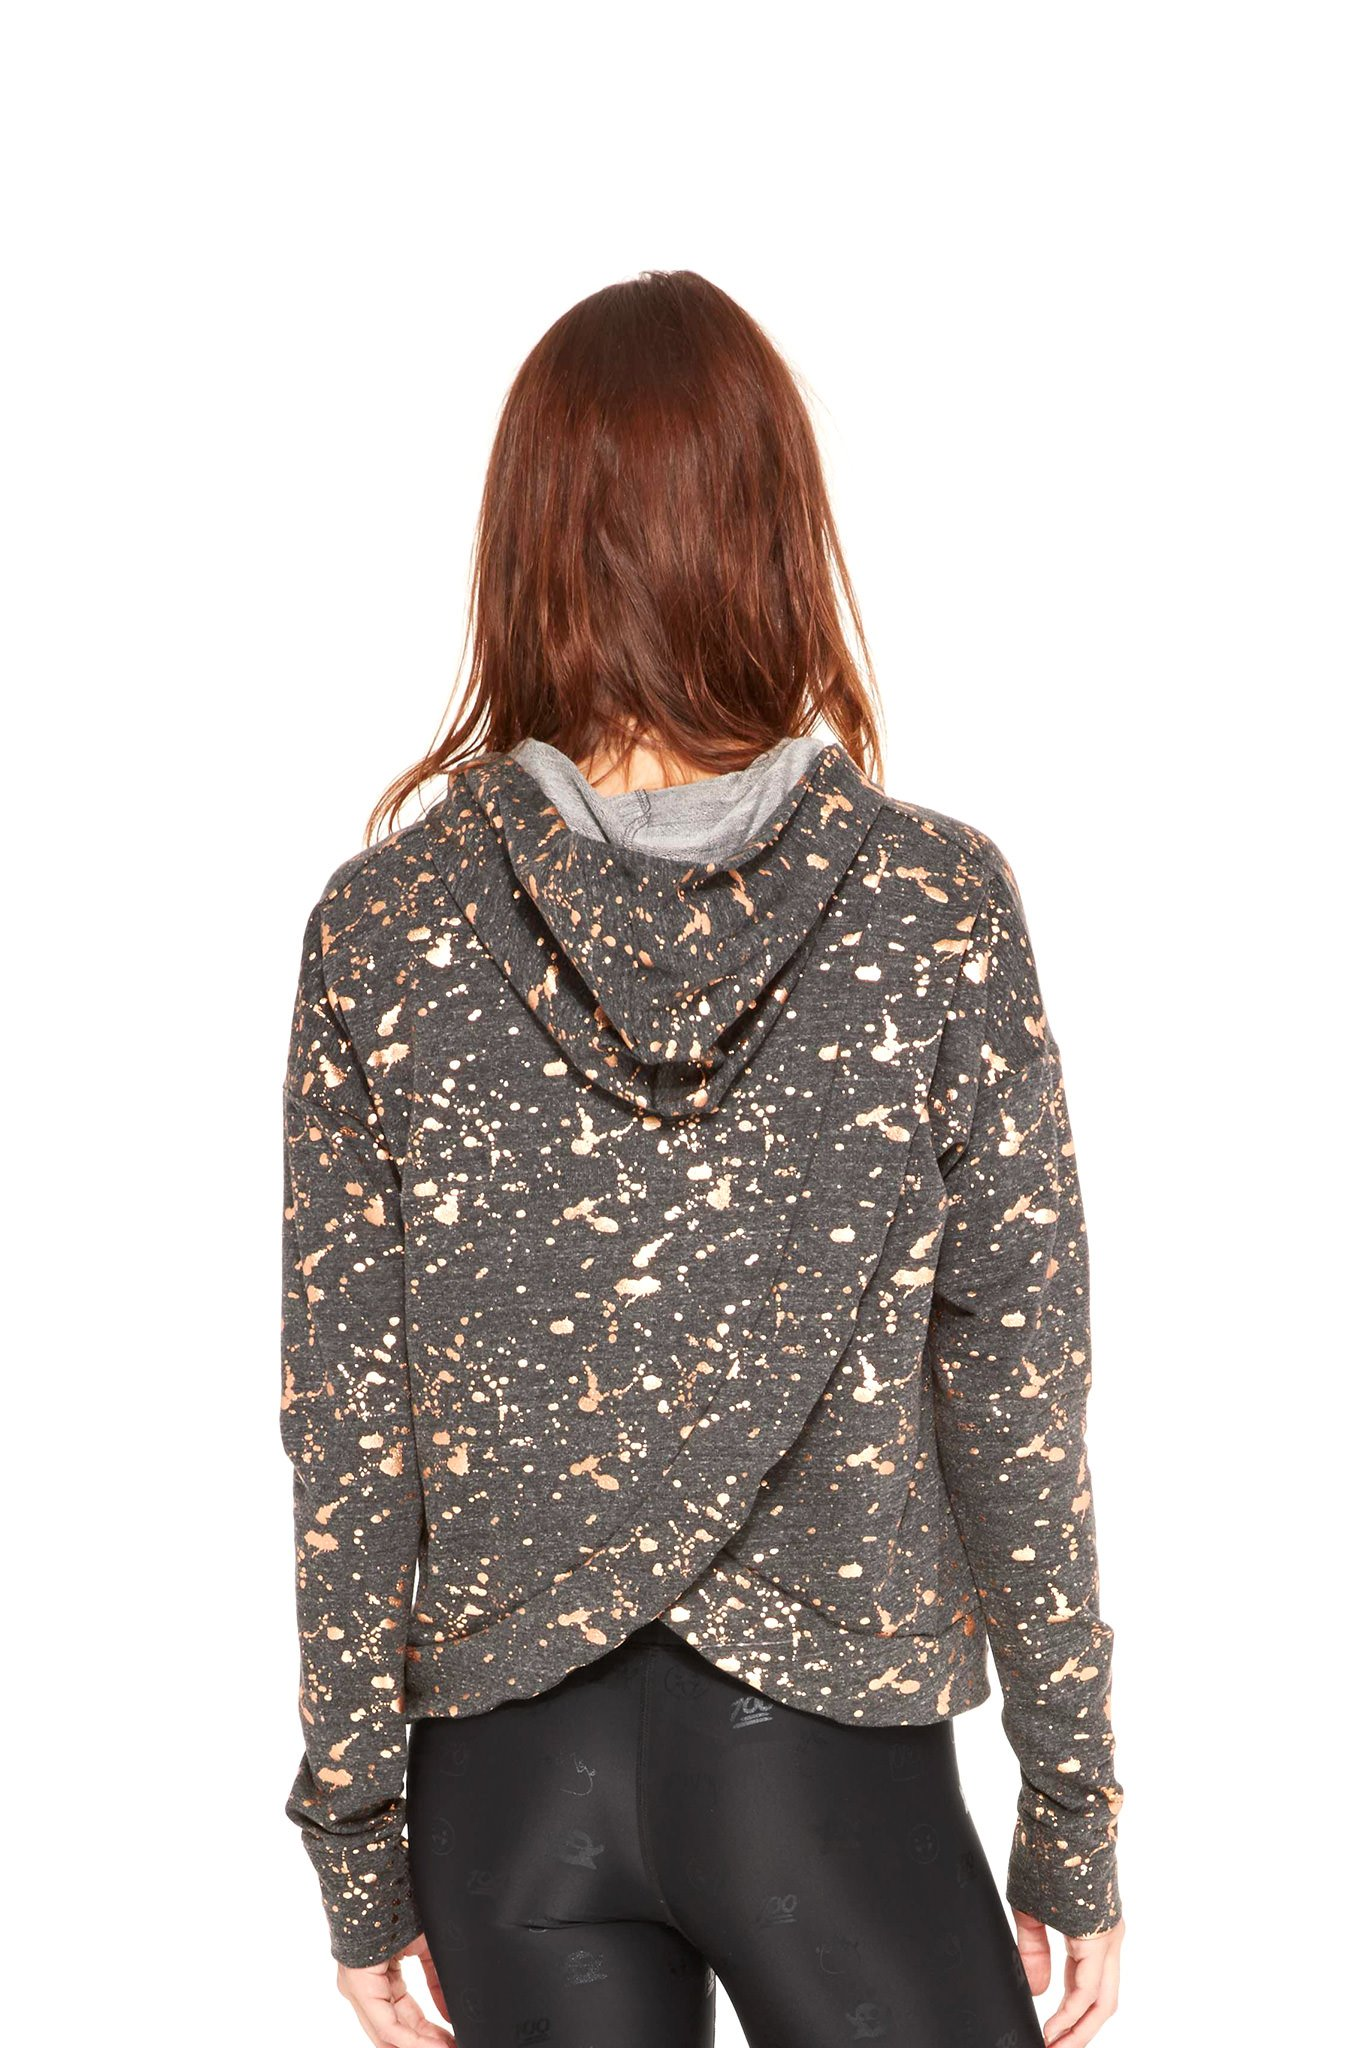 89b455d05 Women's Rose Gold Splatter Foil Cross Back Hoodie   Terez   Trend ...